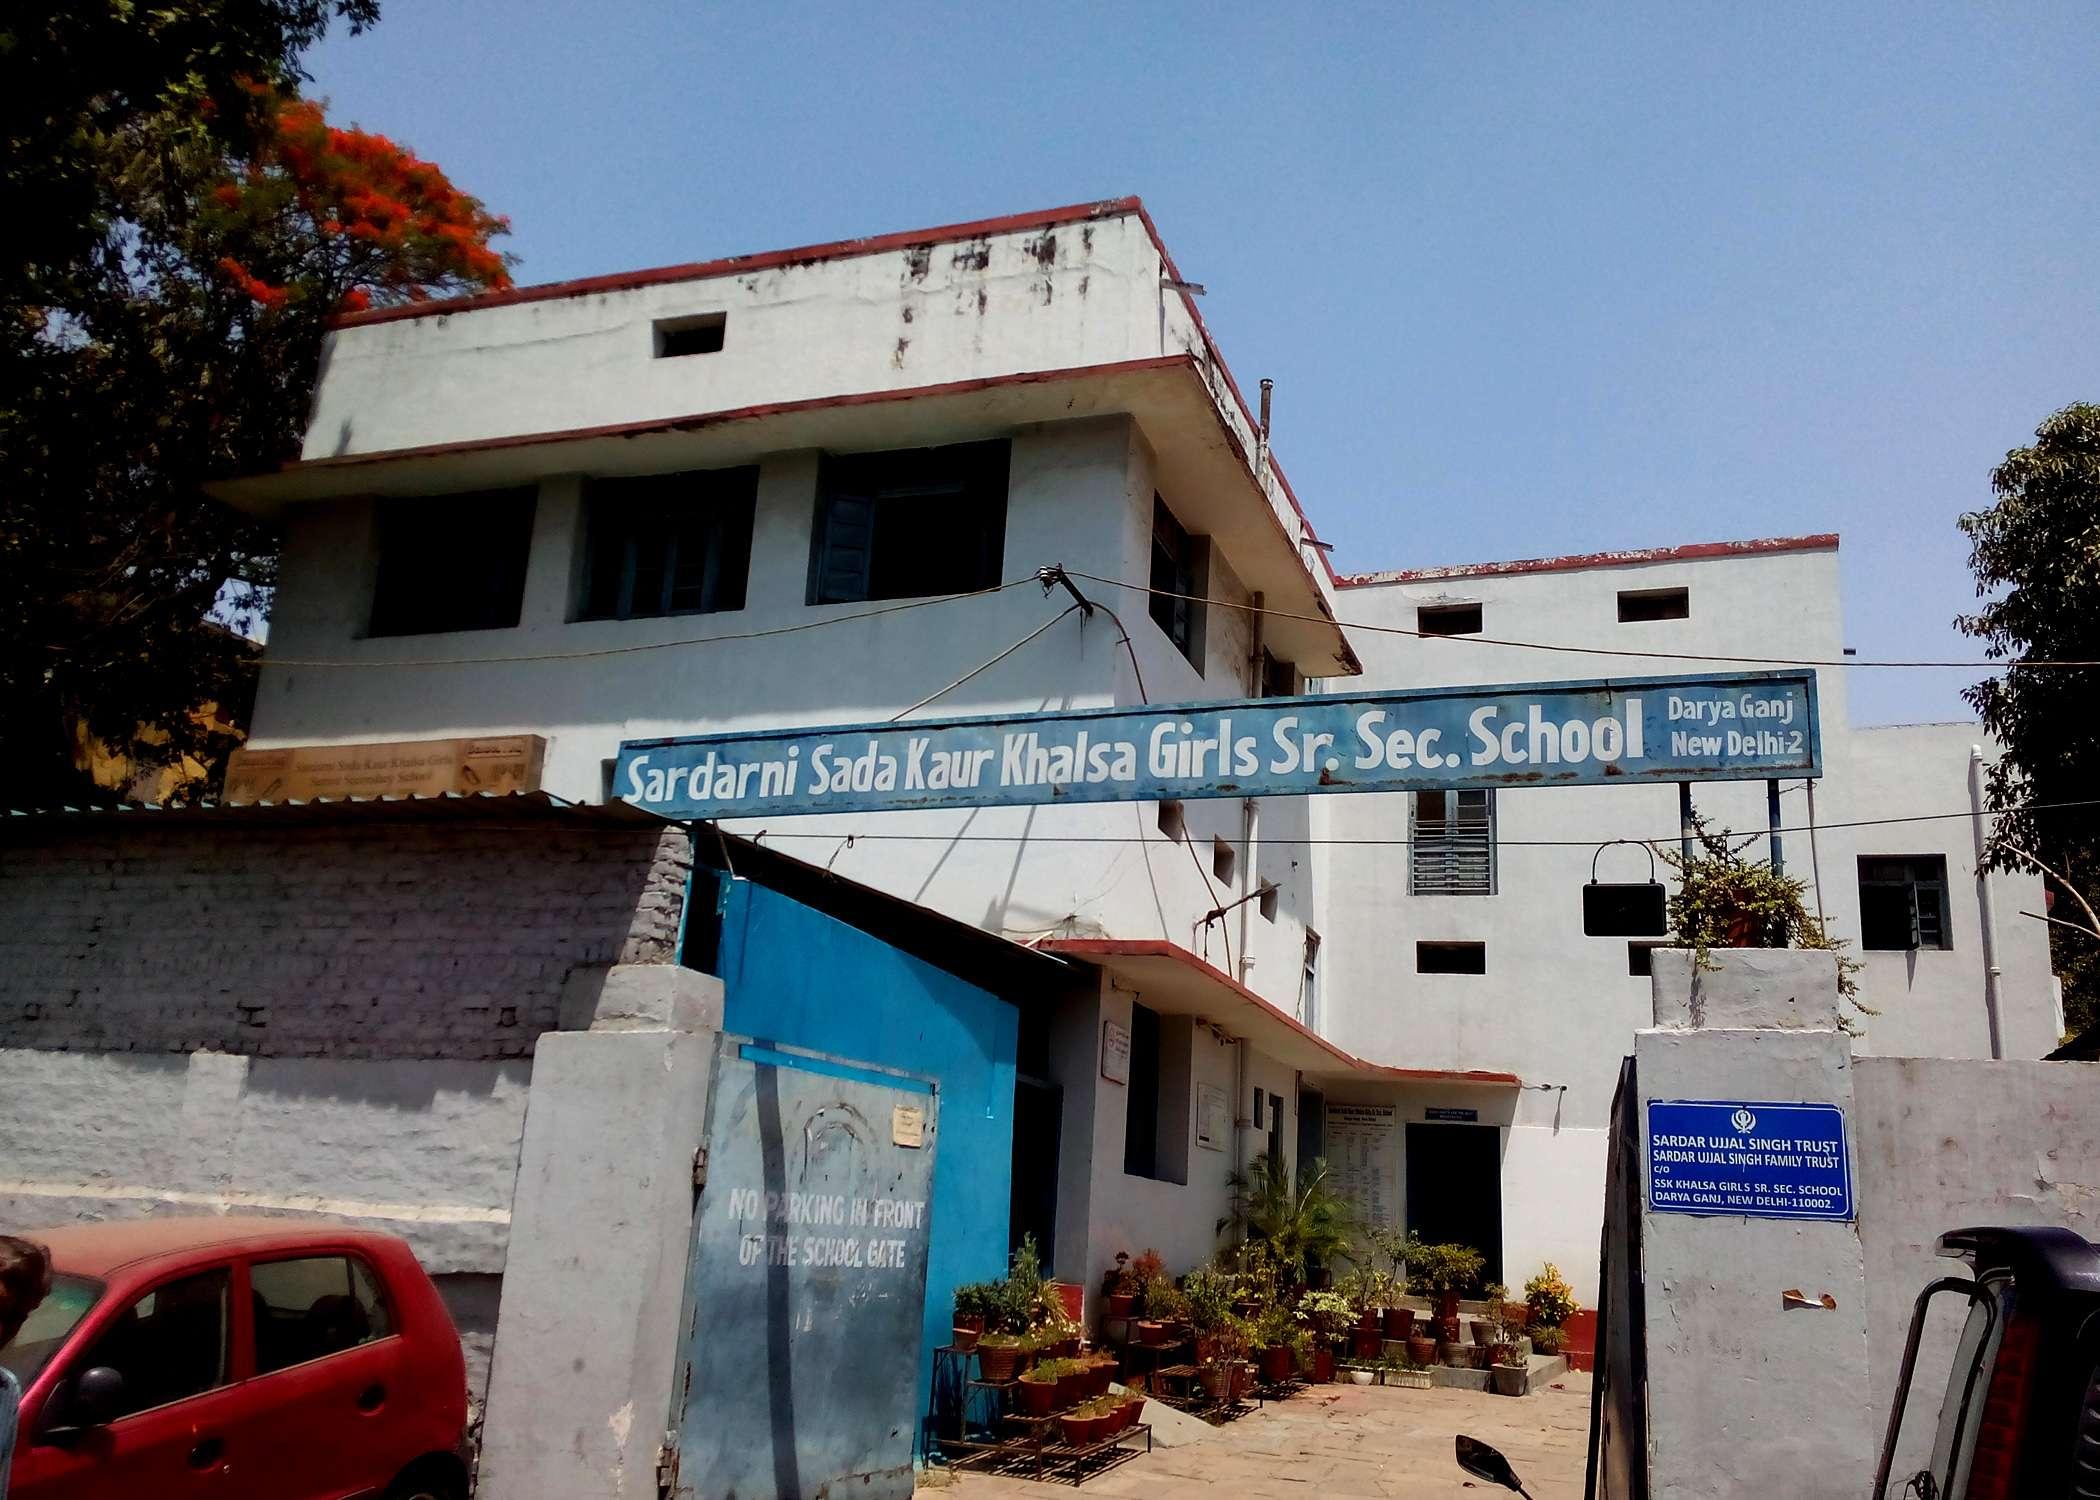 S S K KHALSA GIRLS SR SEC SCHOOL DARYA GANJ NEW DELHI 2788026